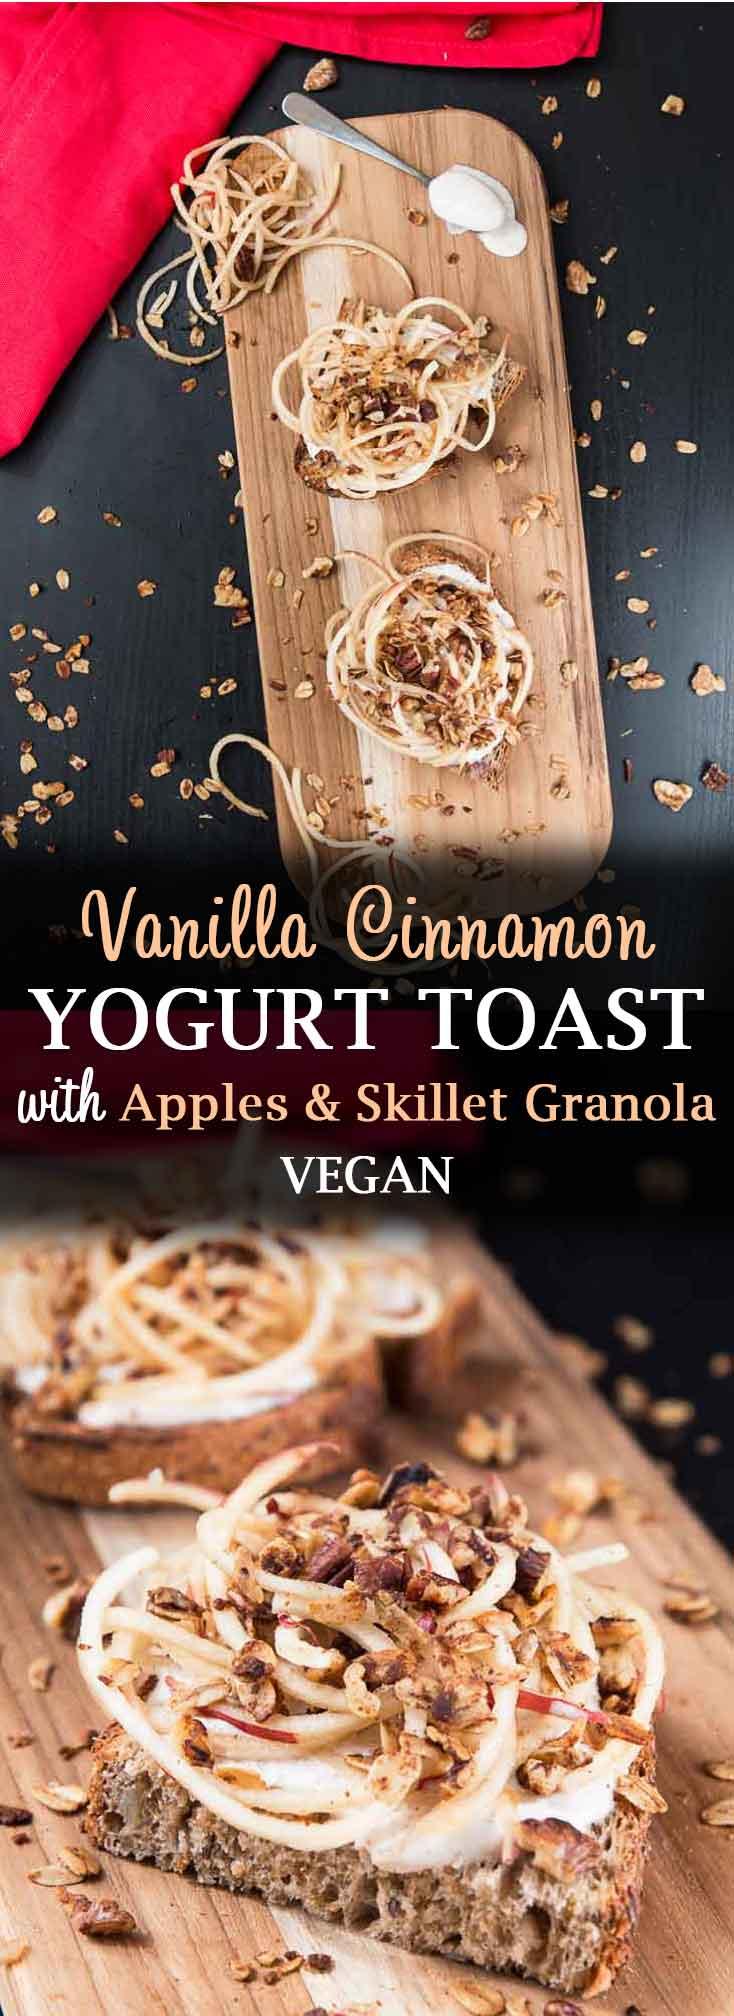 Vanilla Cinnamon Yogurt Toast with Apples & Skillet Granola #vegan #glutenfree #breakfast #silkyoucanspoon #veganrecipes #veganfood | Vegetarian Gastronomy | www.VegetarianGastronomy.com